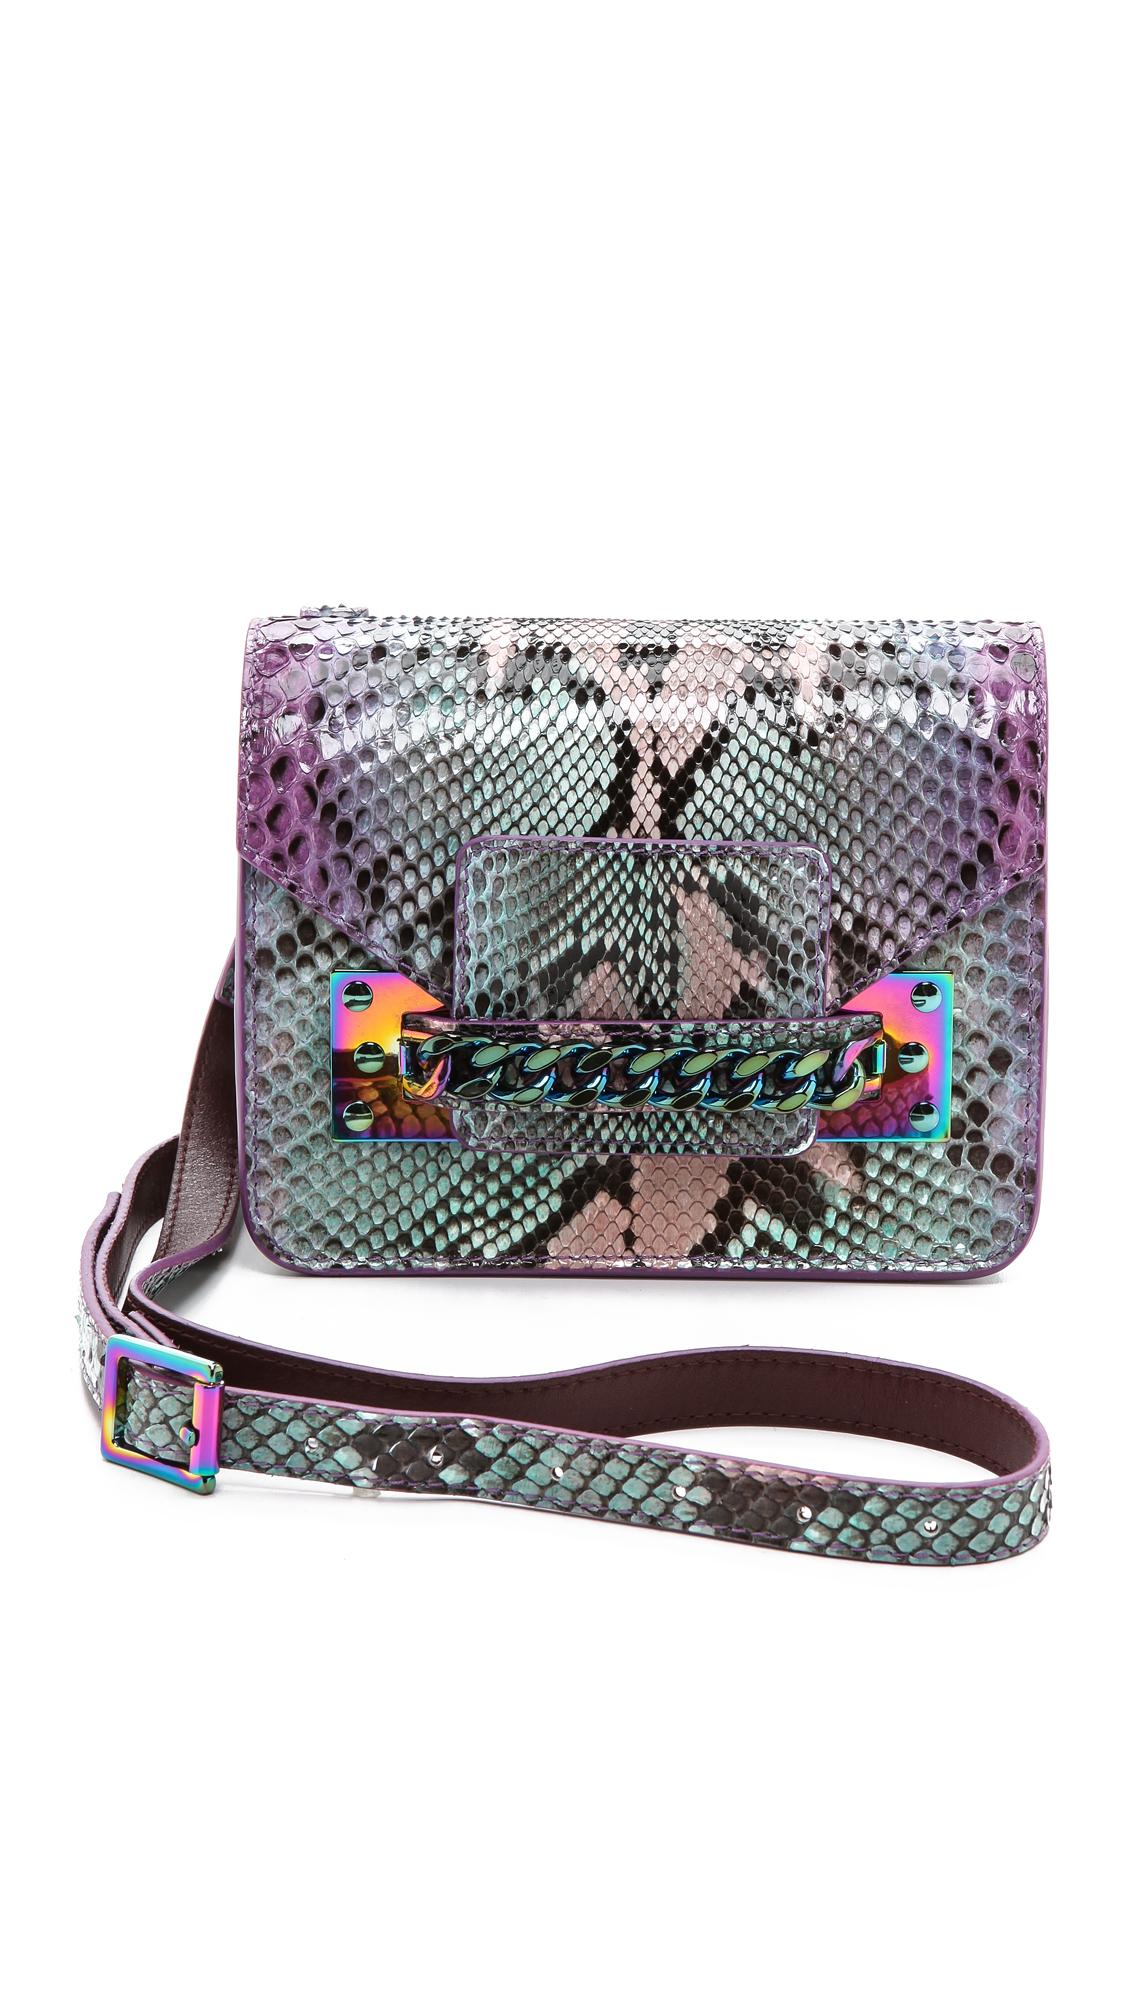 999634985b83 Lyst - Sophie Hulme Python Chain Mini Envelope Bag - Purple Mint in Green